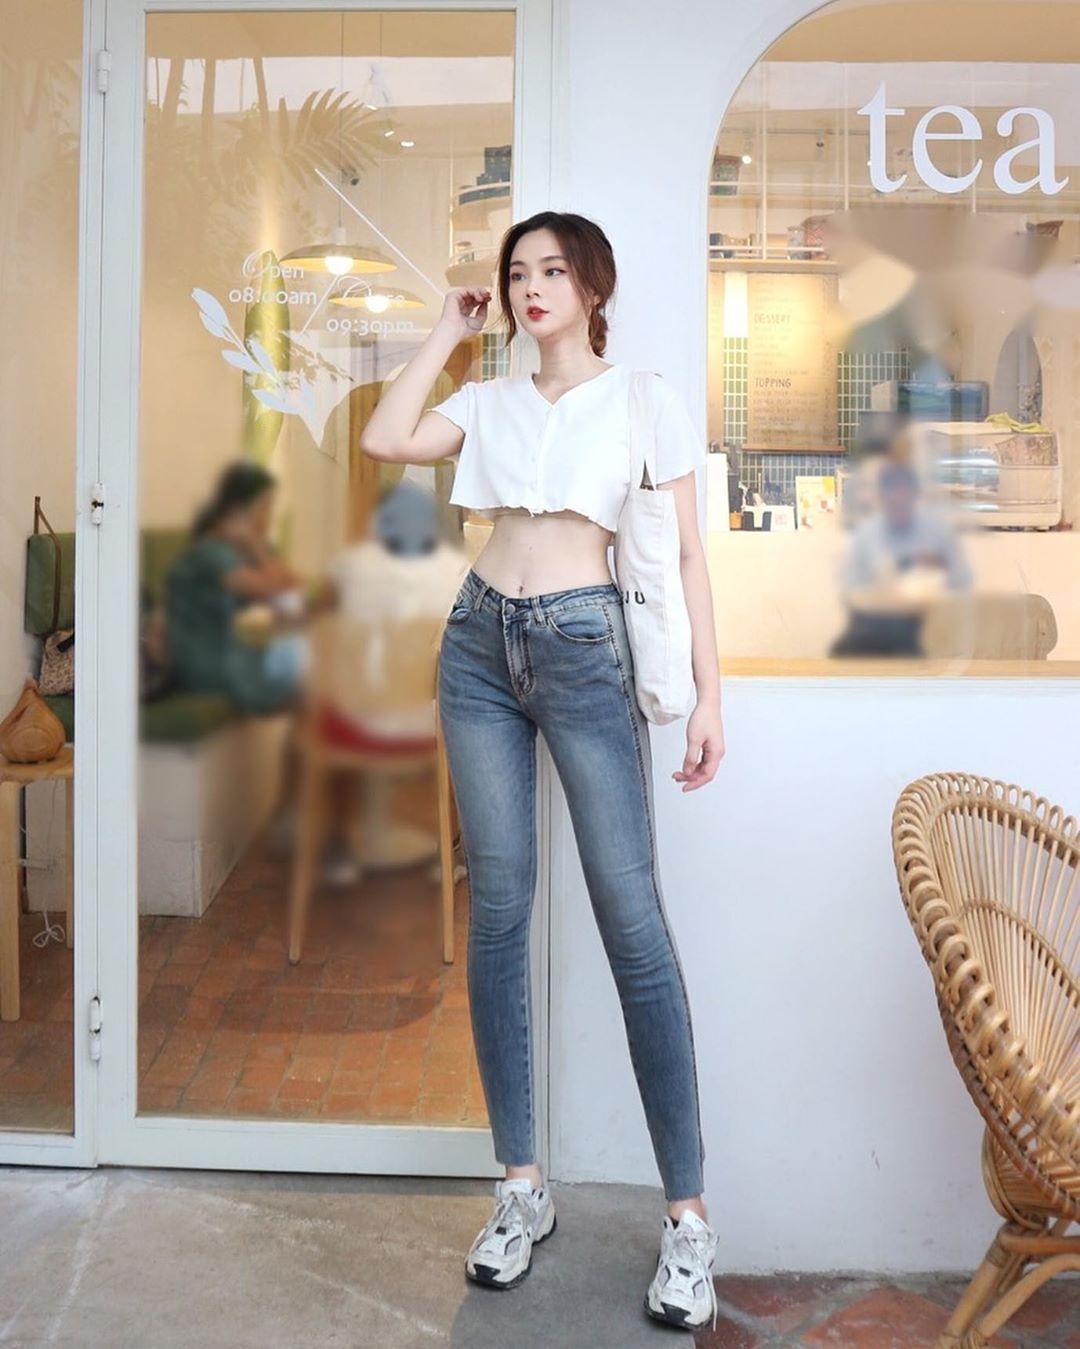 [DENIM PLUS JEANS SHOP] noi de nang thoa man niem dam me quan jeans bat tan (1)